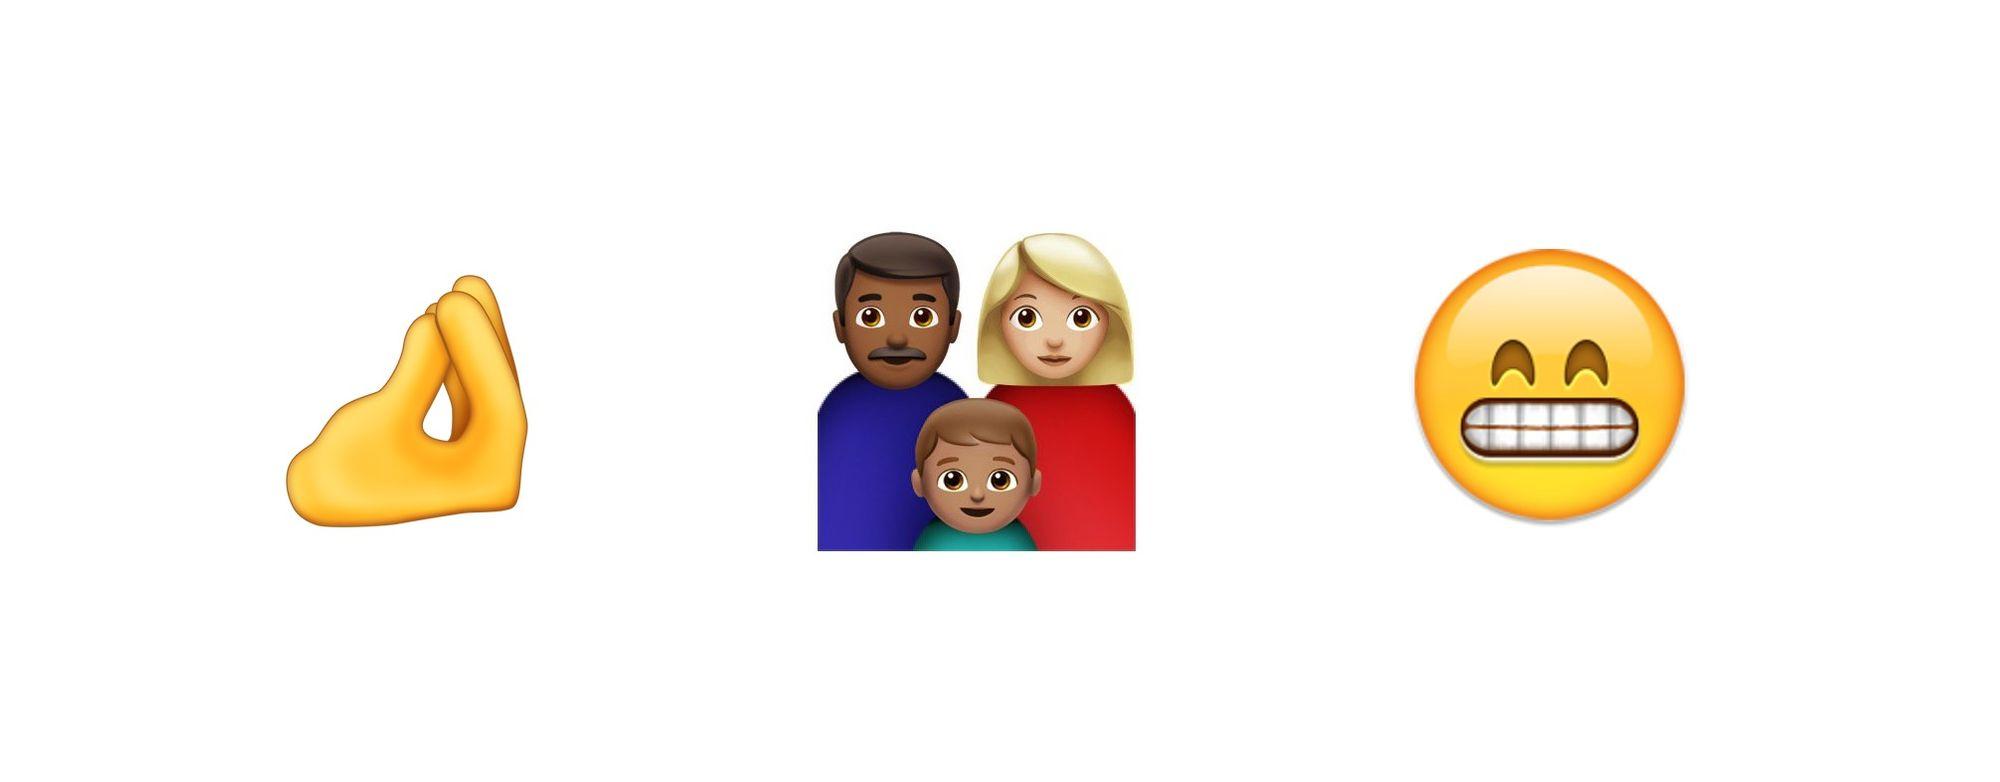 Top Emoji Requests 2017